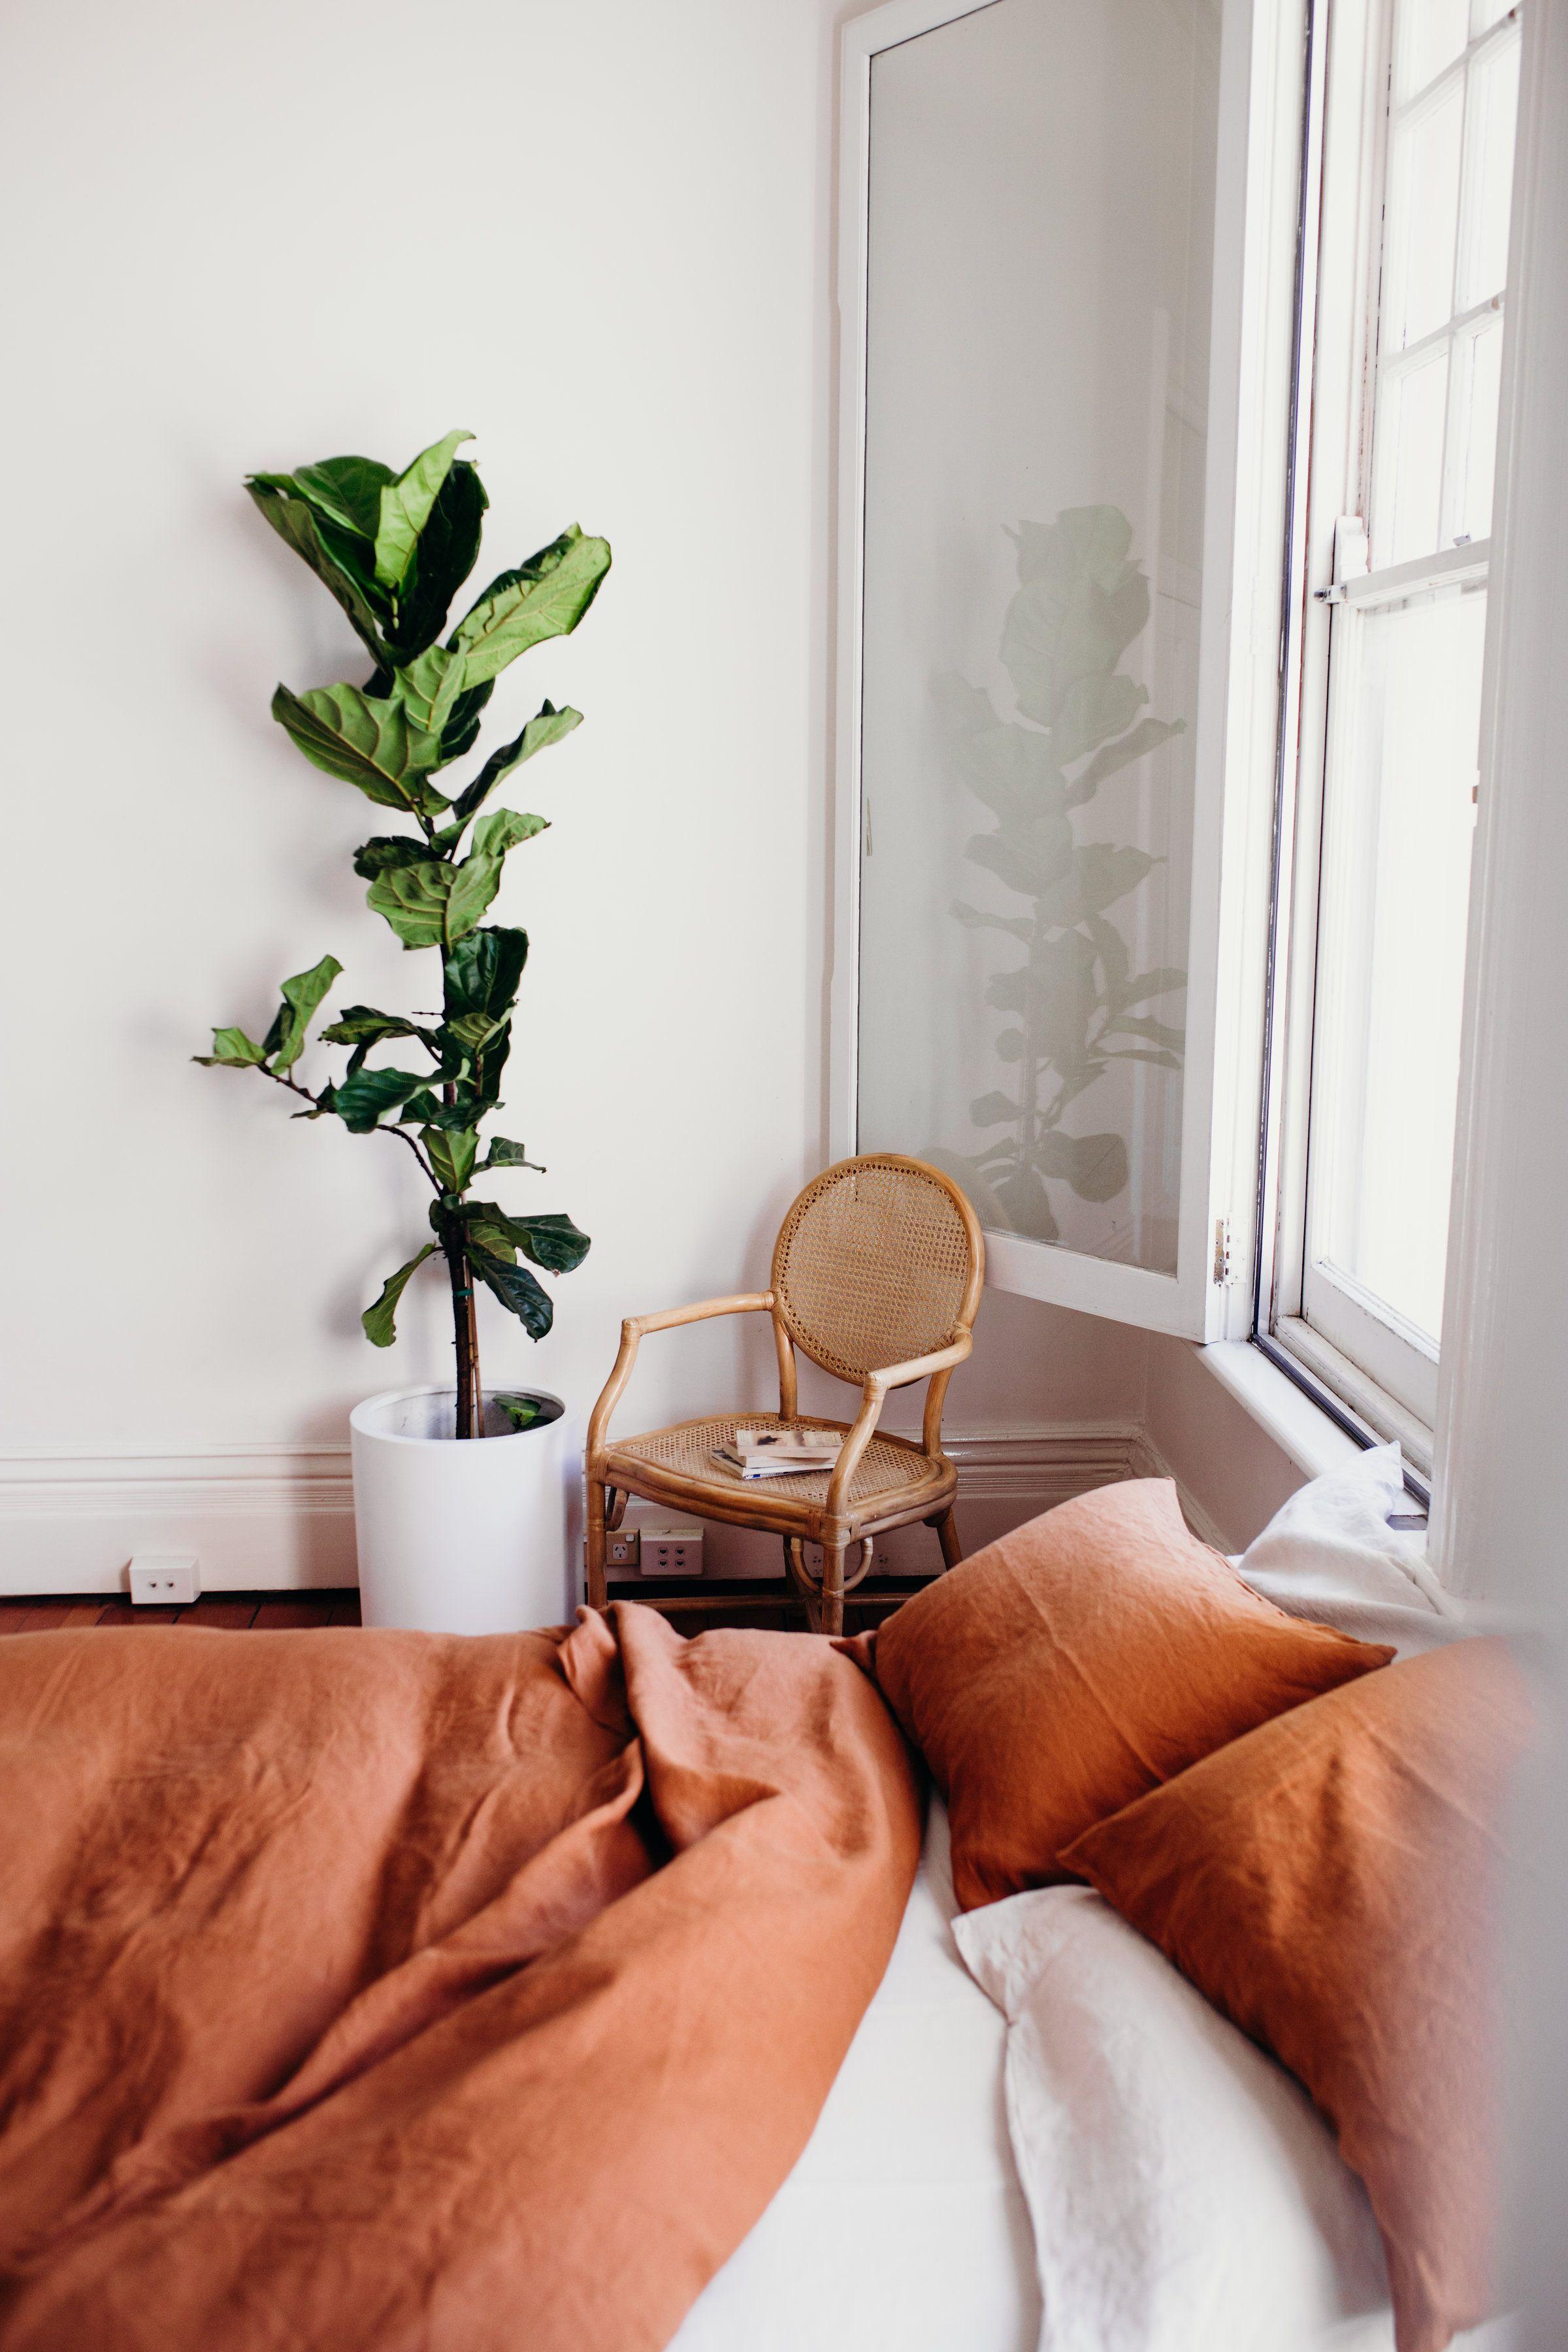 oranje beddengoed woonkamer oranje slaapkamer inspo slaapkamerdecoratie slaapkamer organisatie geel huisje